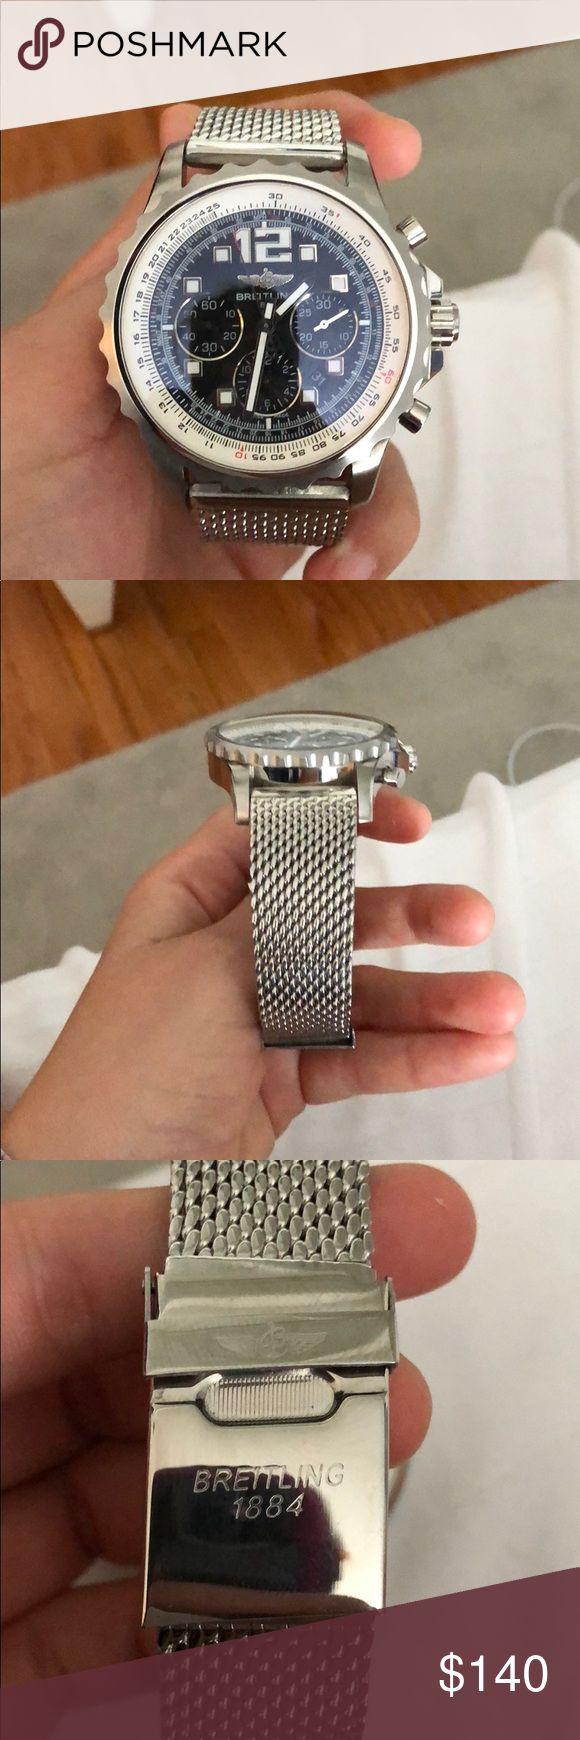 Breitling Bentley 1884 watch imitation Swiss made imitation breitling watch Accessories Watches